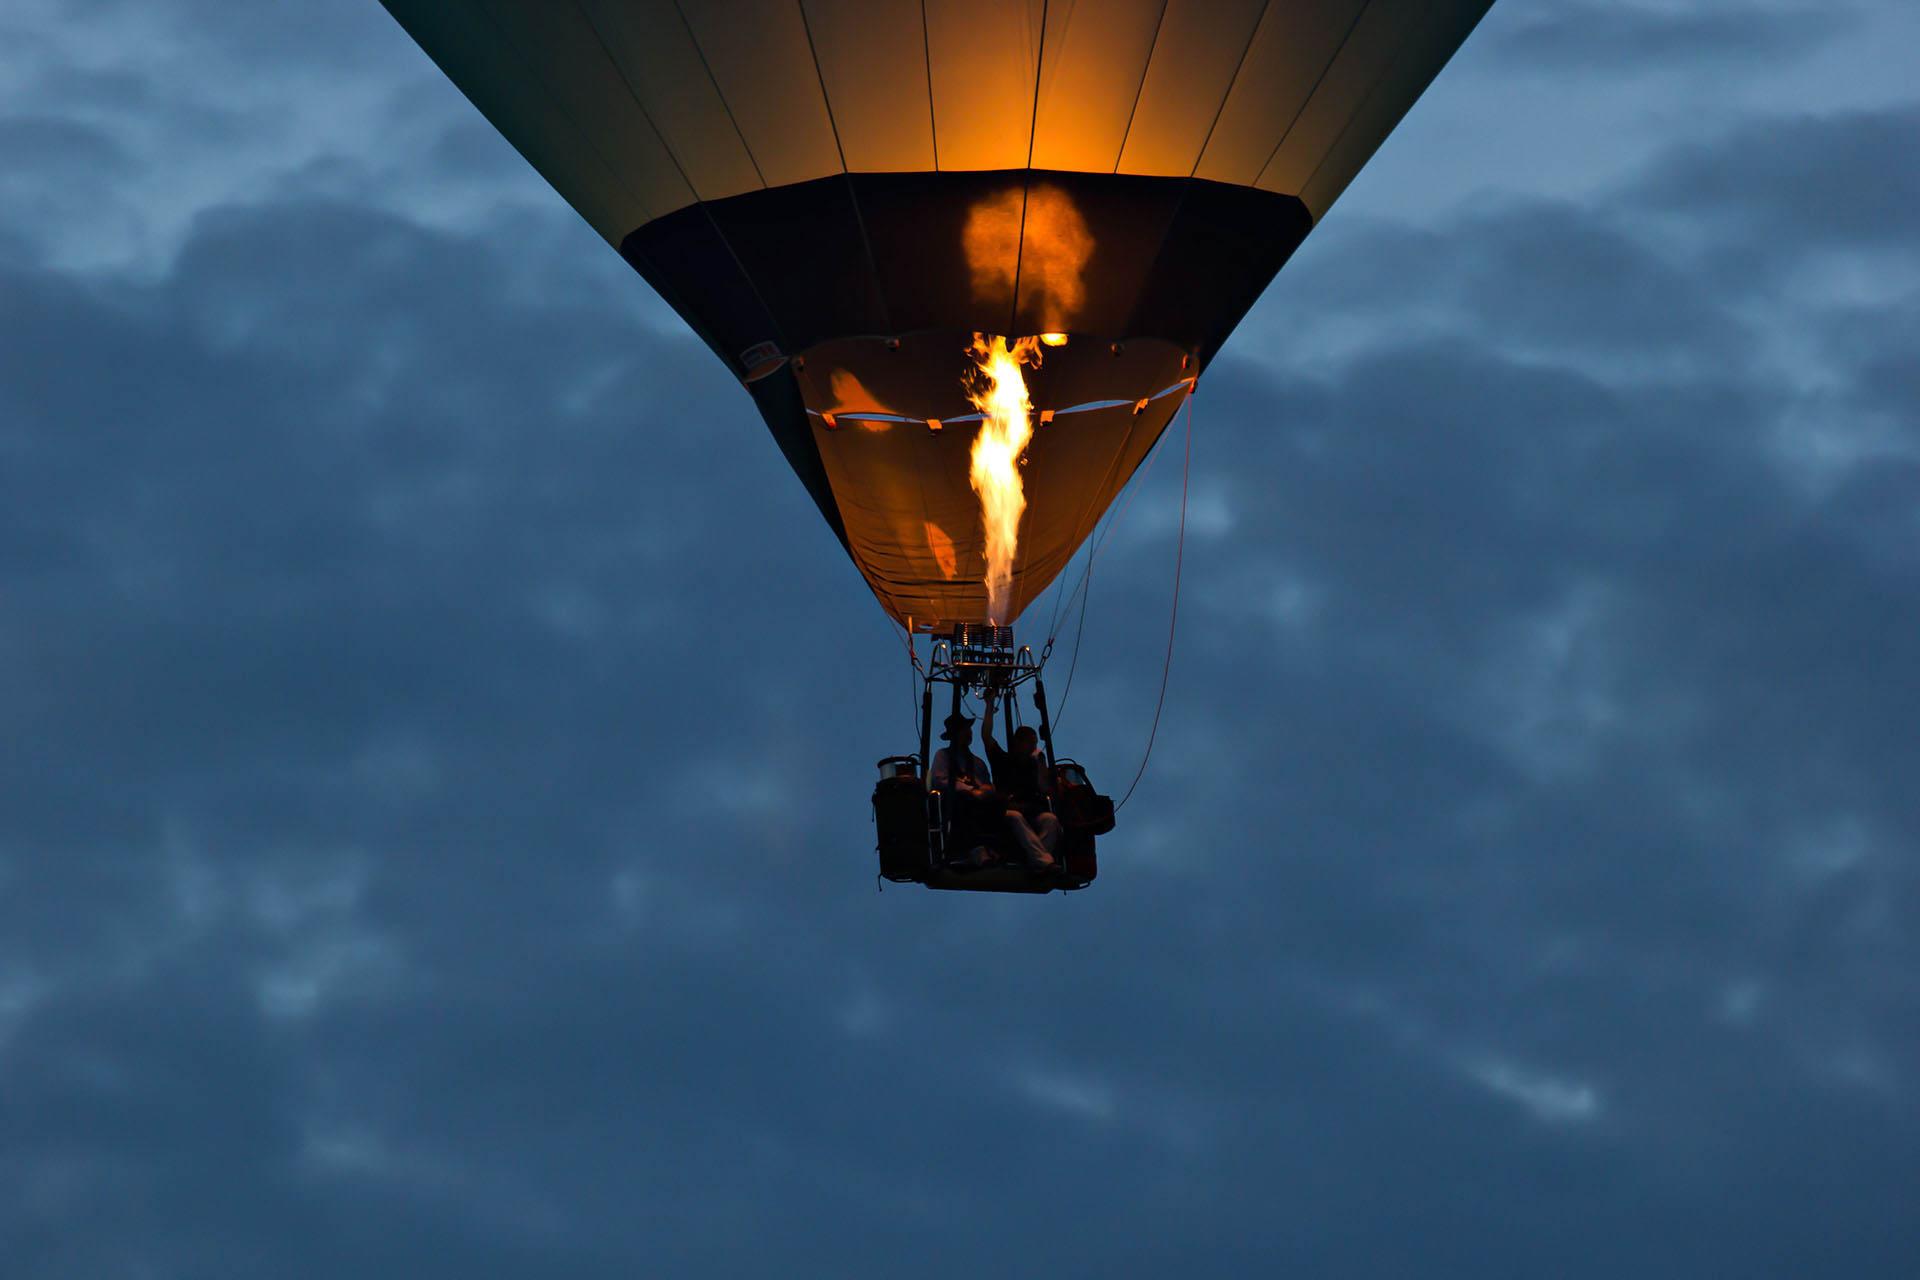 Aeronautique Montgolfiere – Agnes Briand Photographe